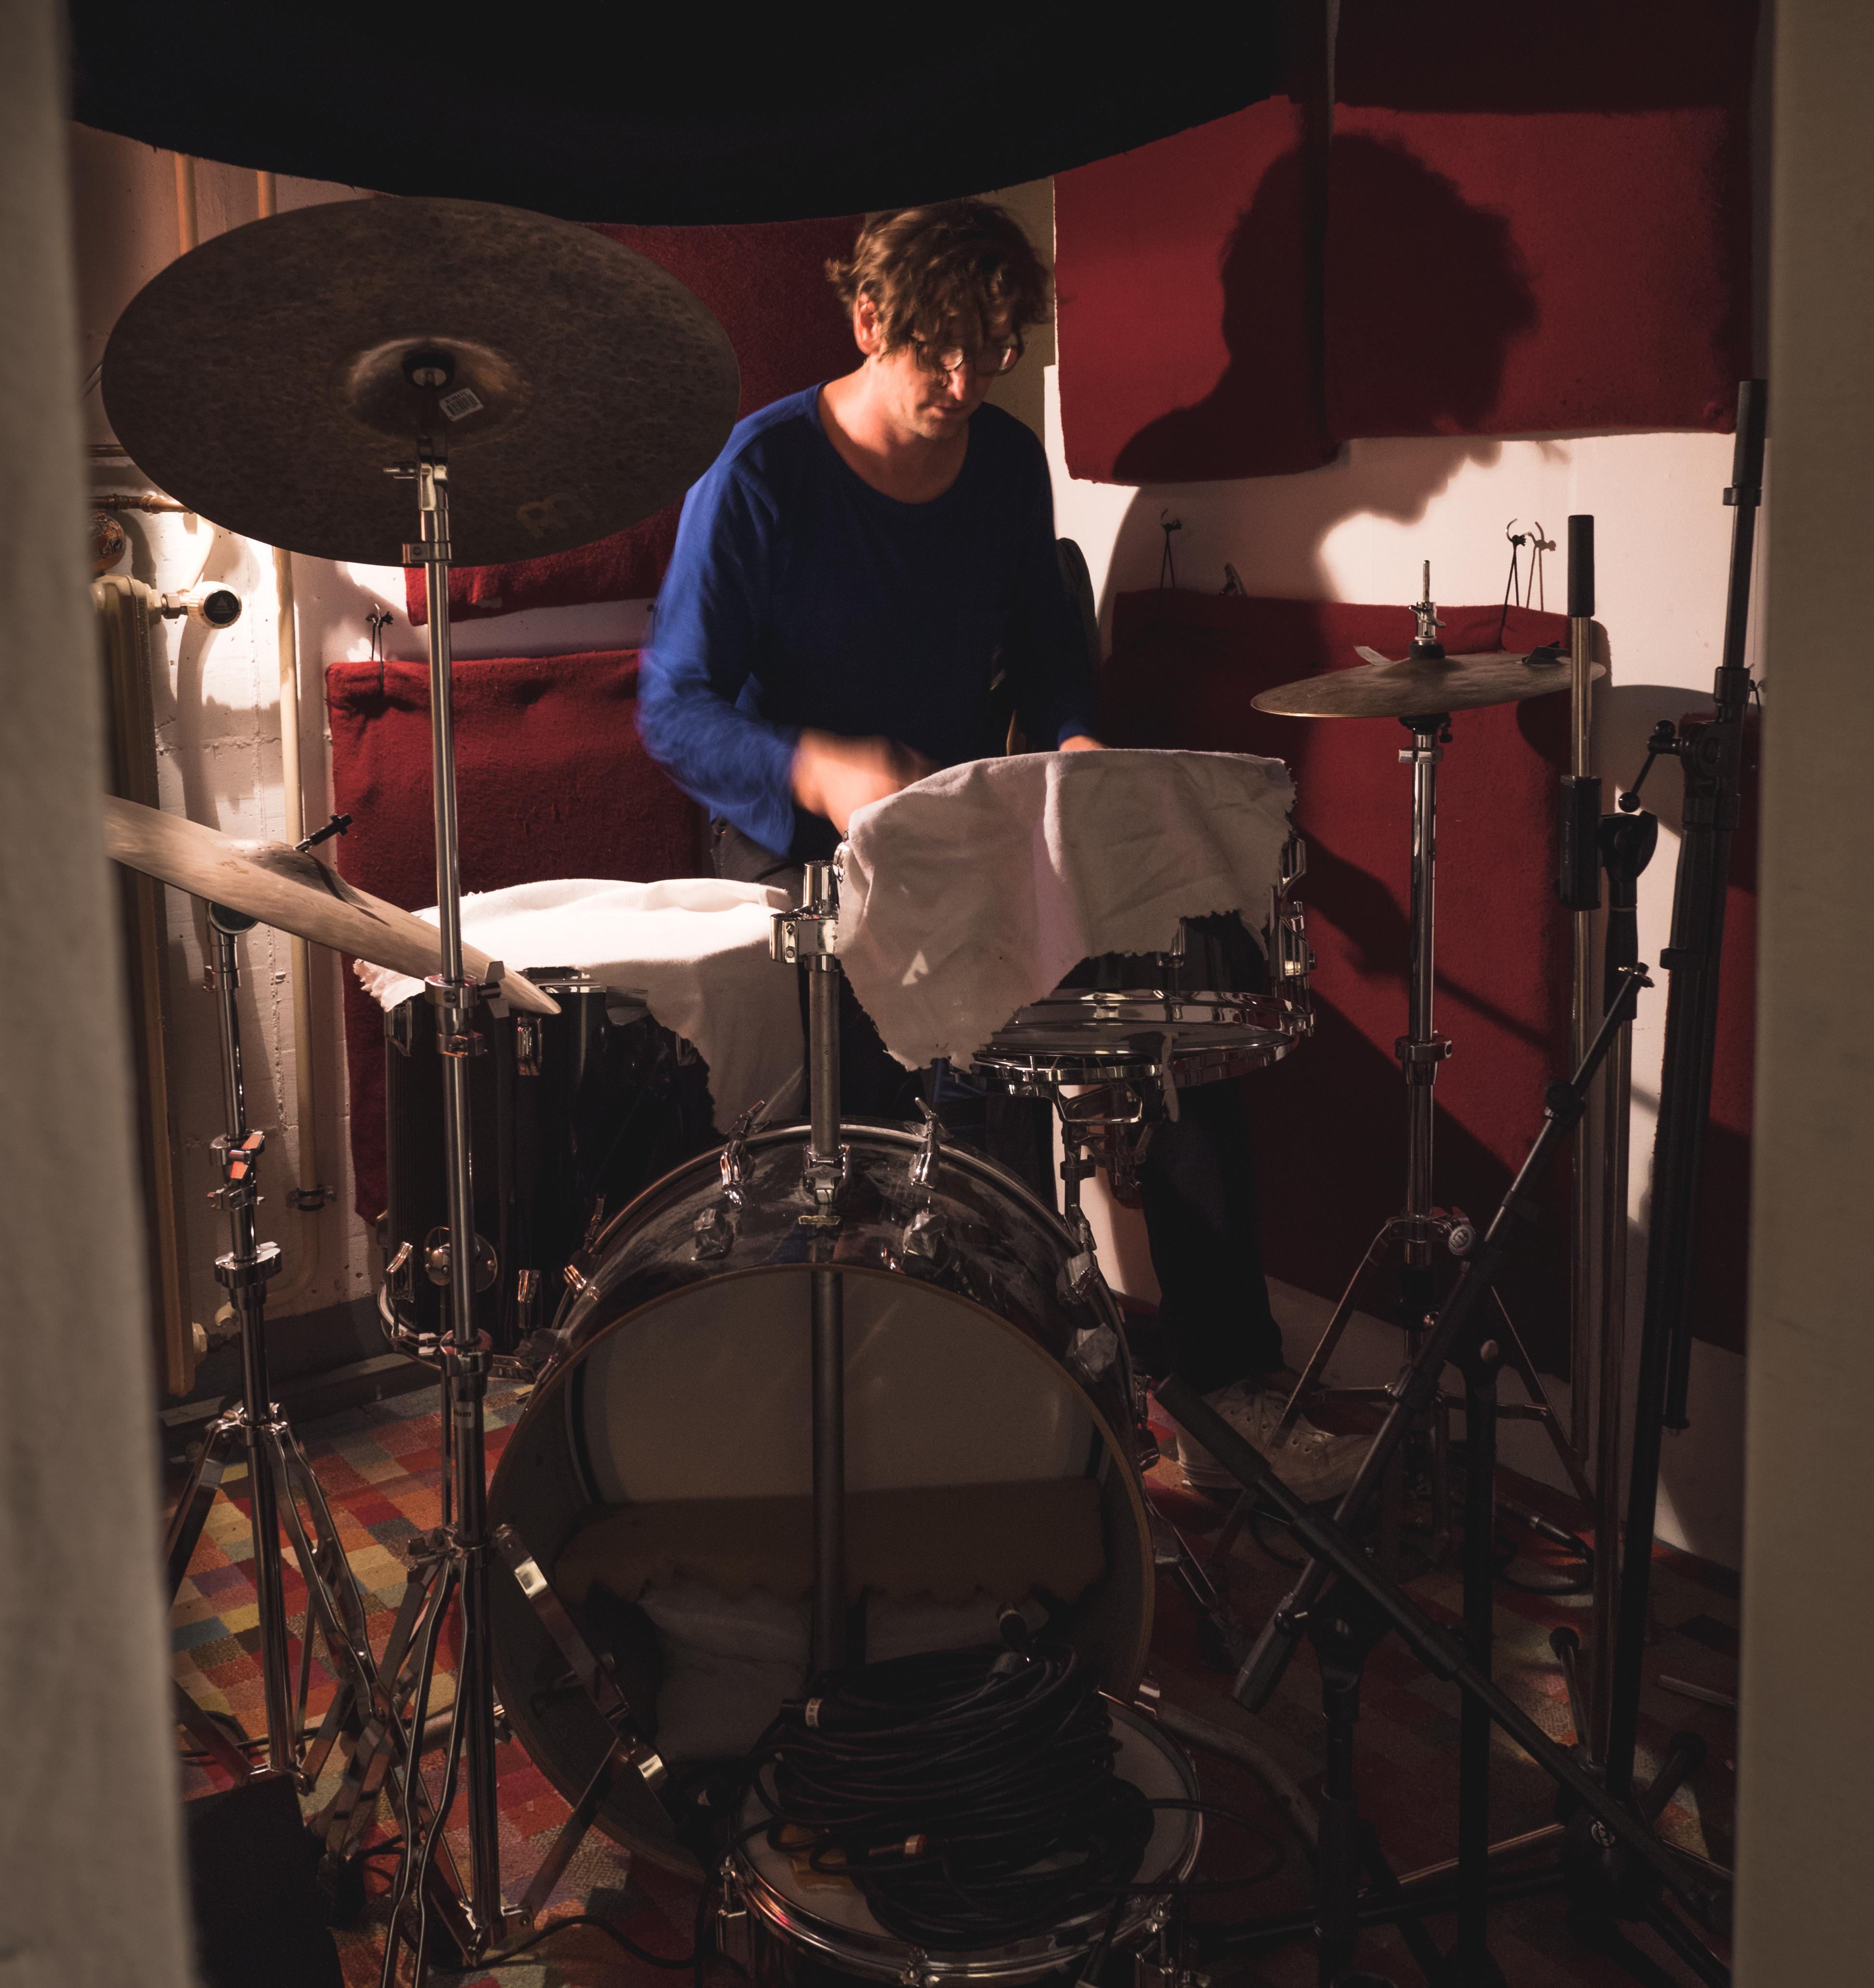 Rodgers Drum Kit